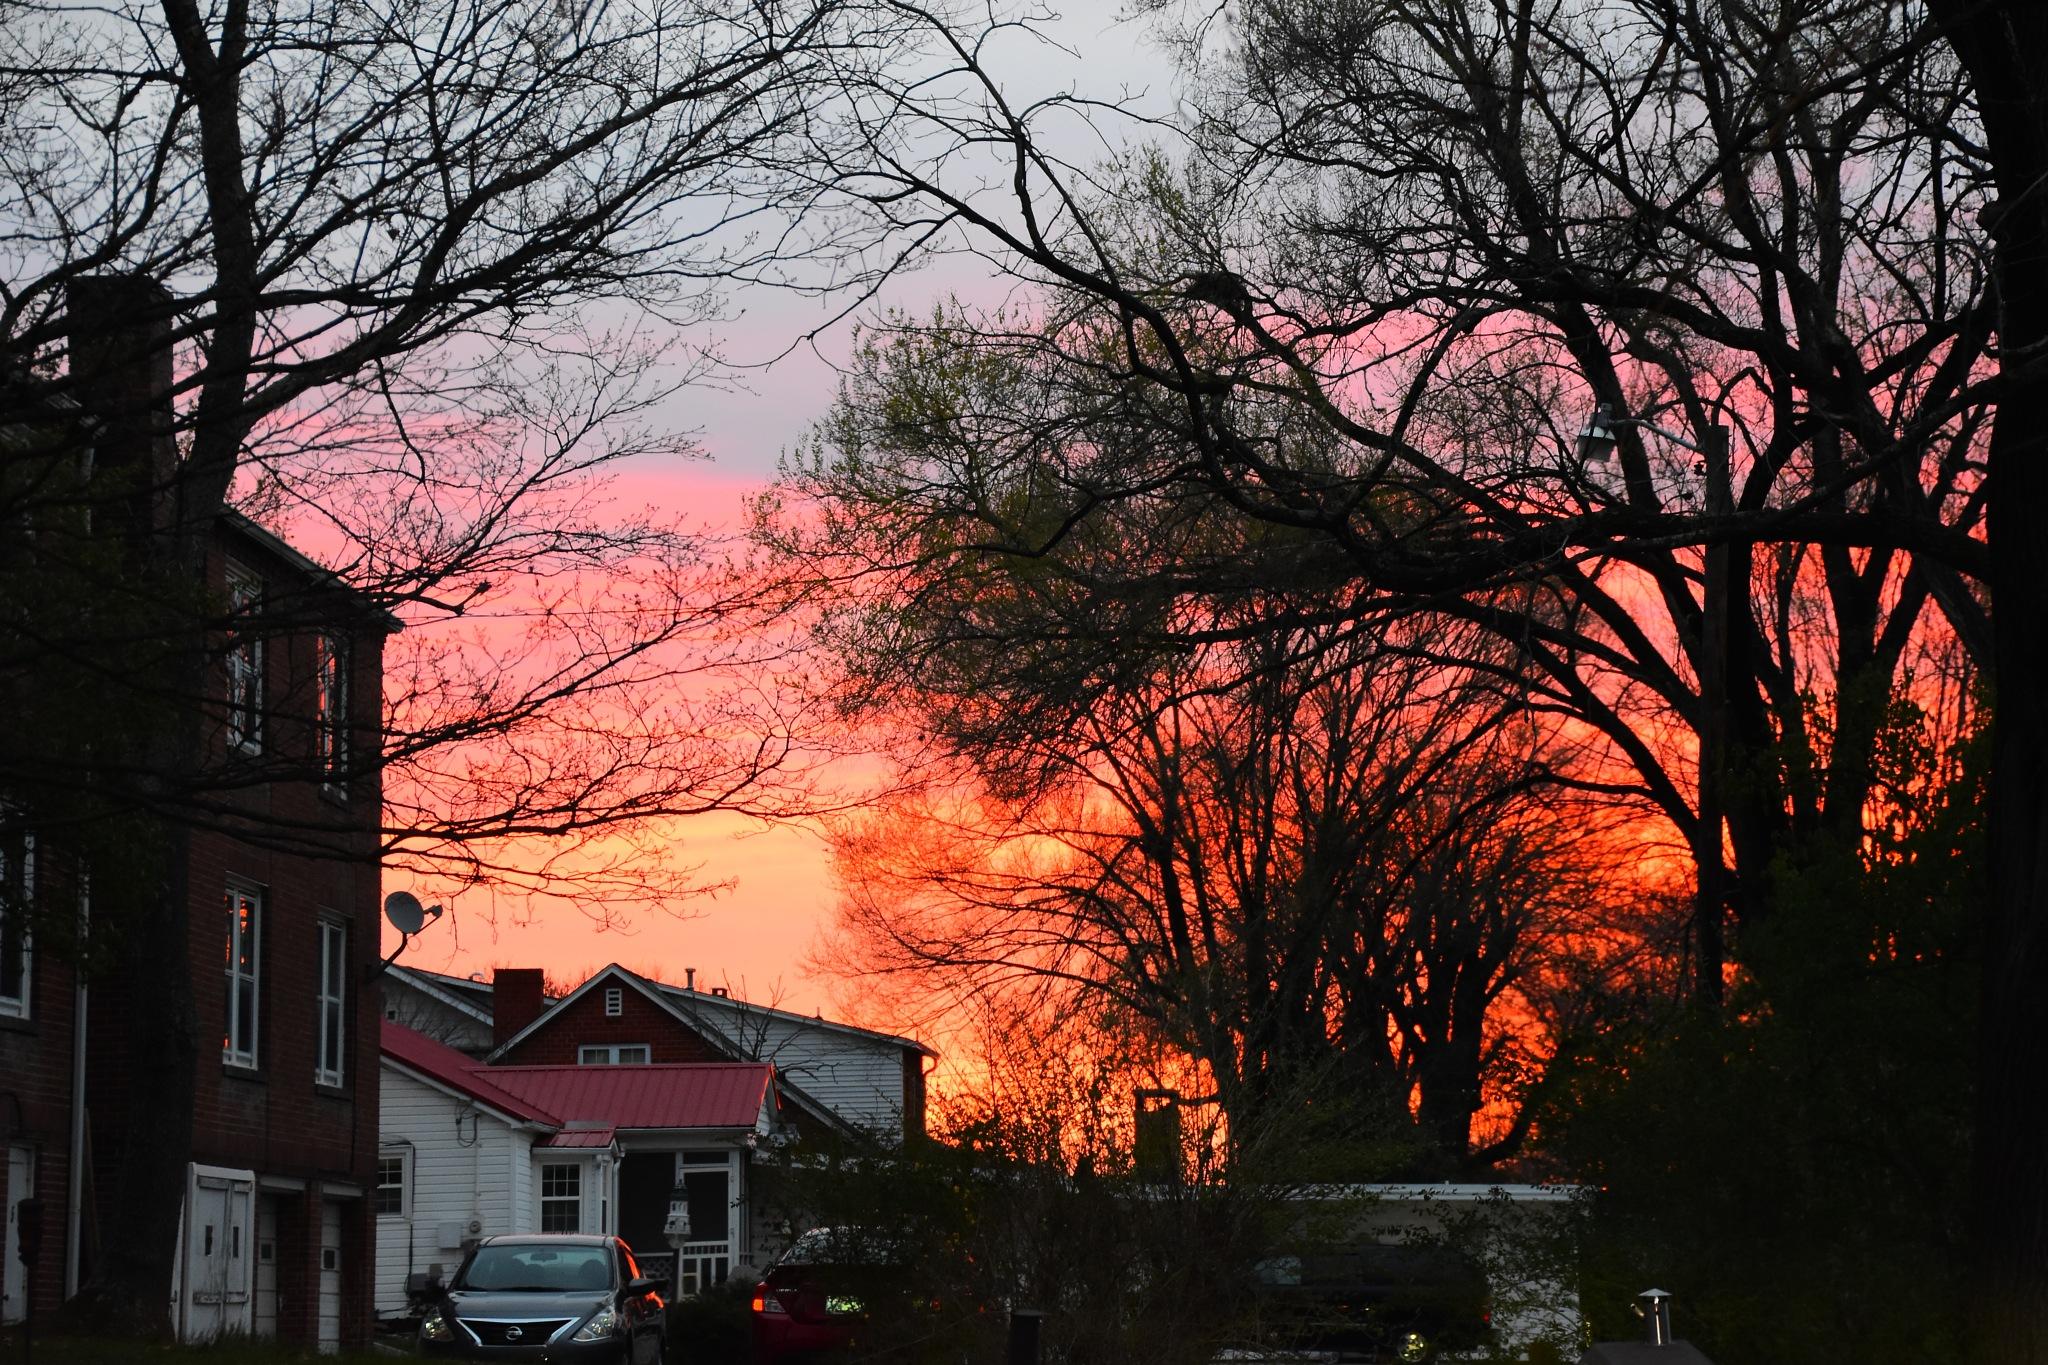 Sunrise 1 March 17 by Greg Knott